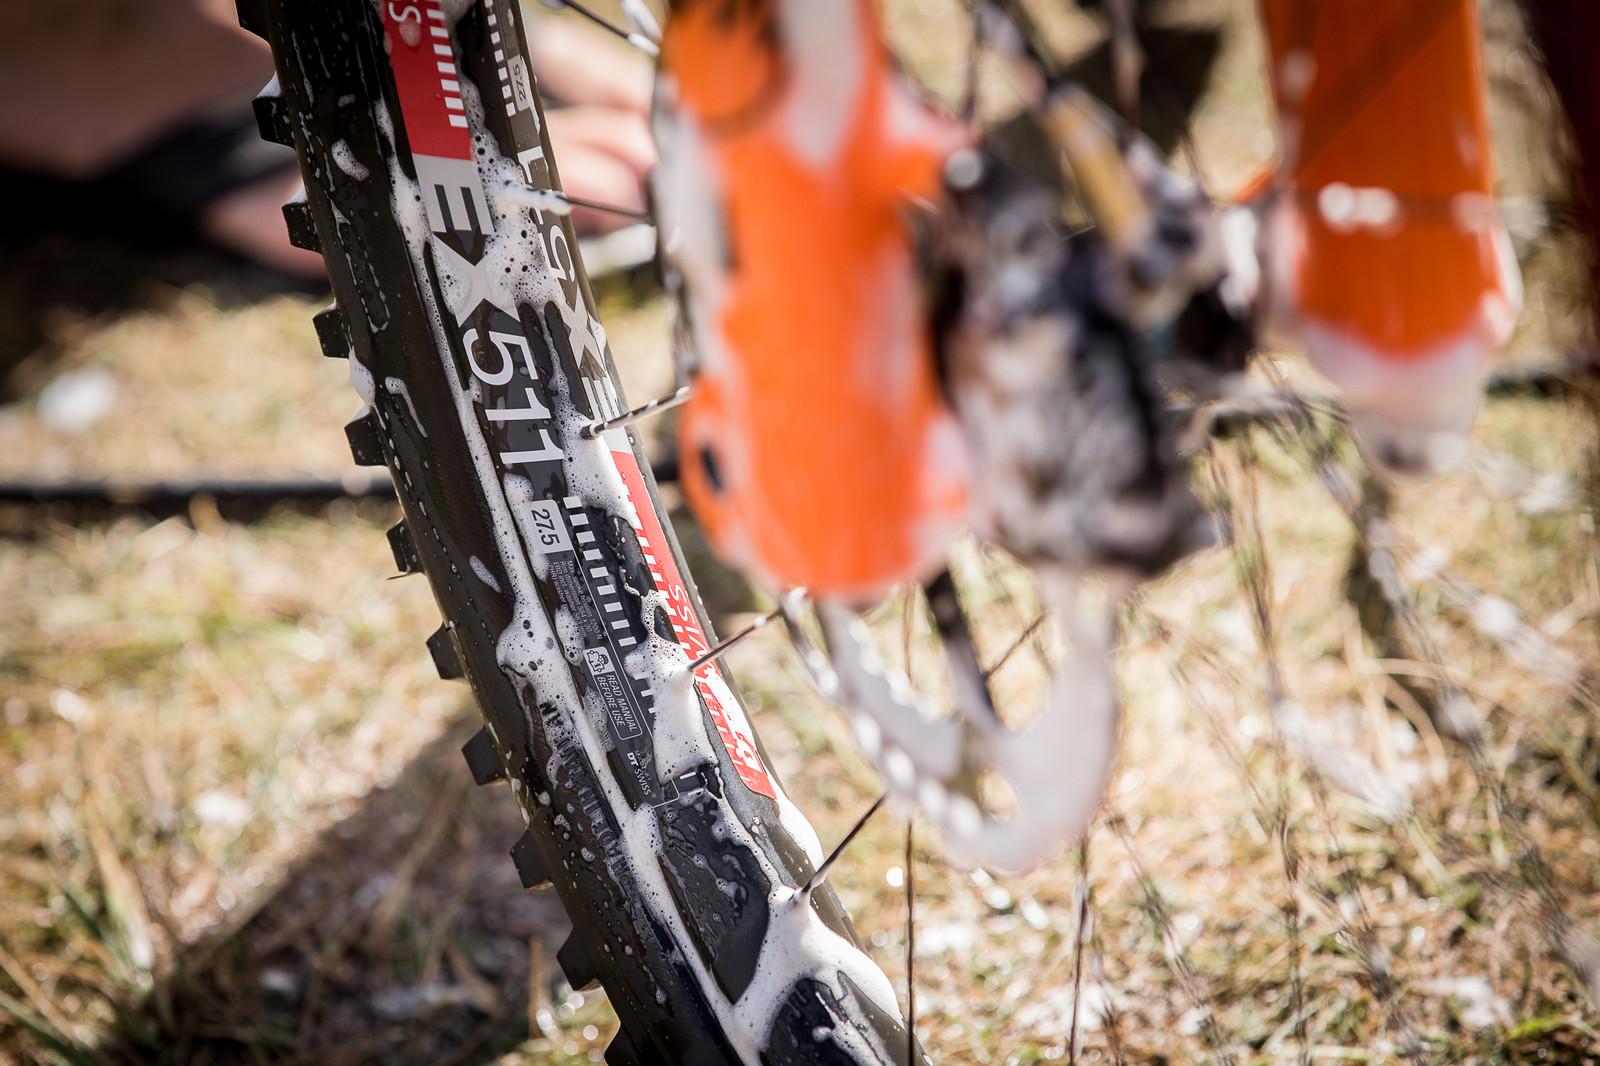 Wide Rims for Richie - PIT BITS - Enduro World Series, Valberg - Mountain Biking Pictures - Vital MTB